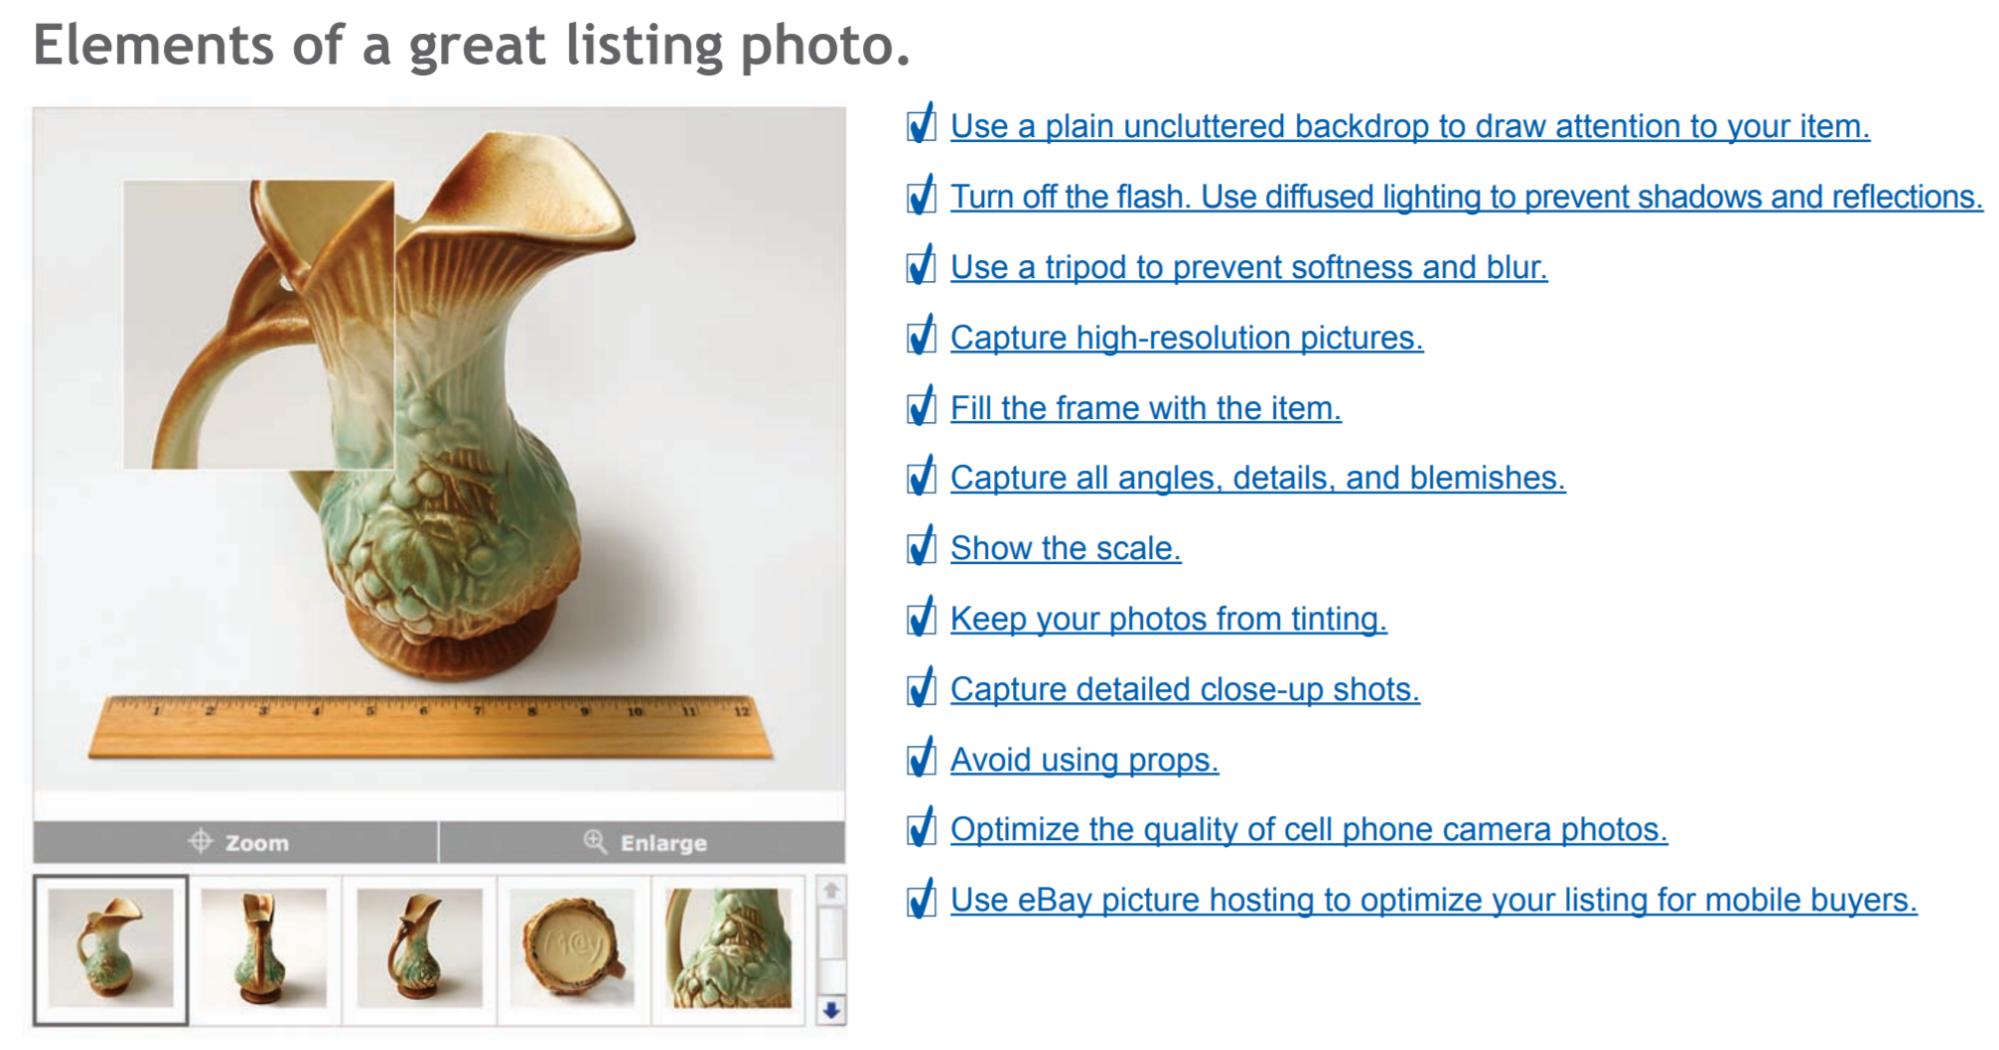 ebay listing photo elements